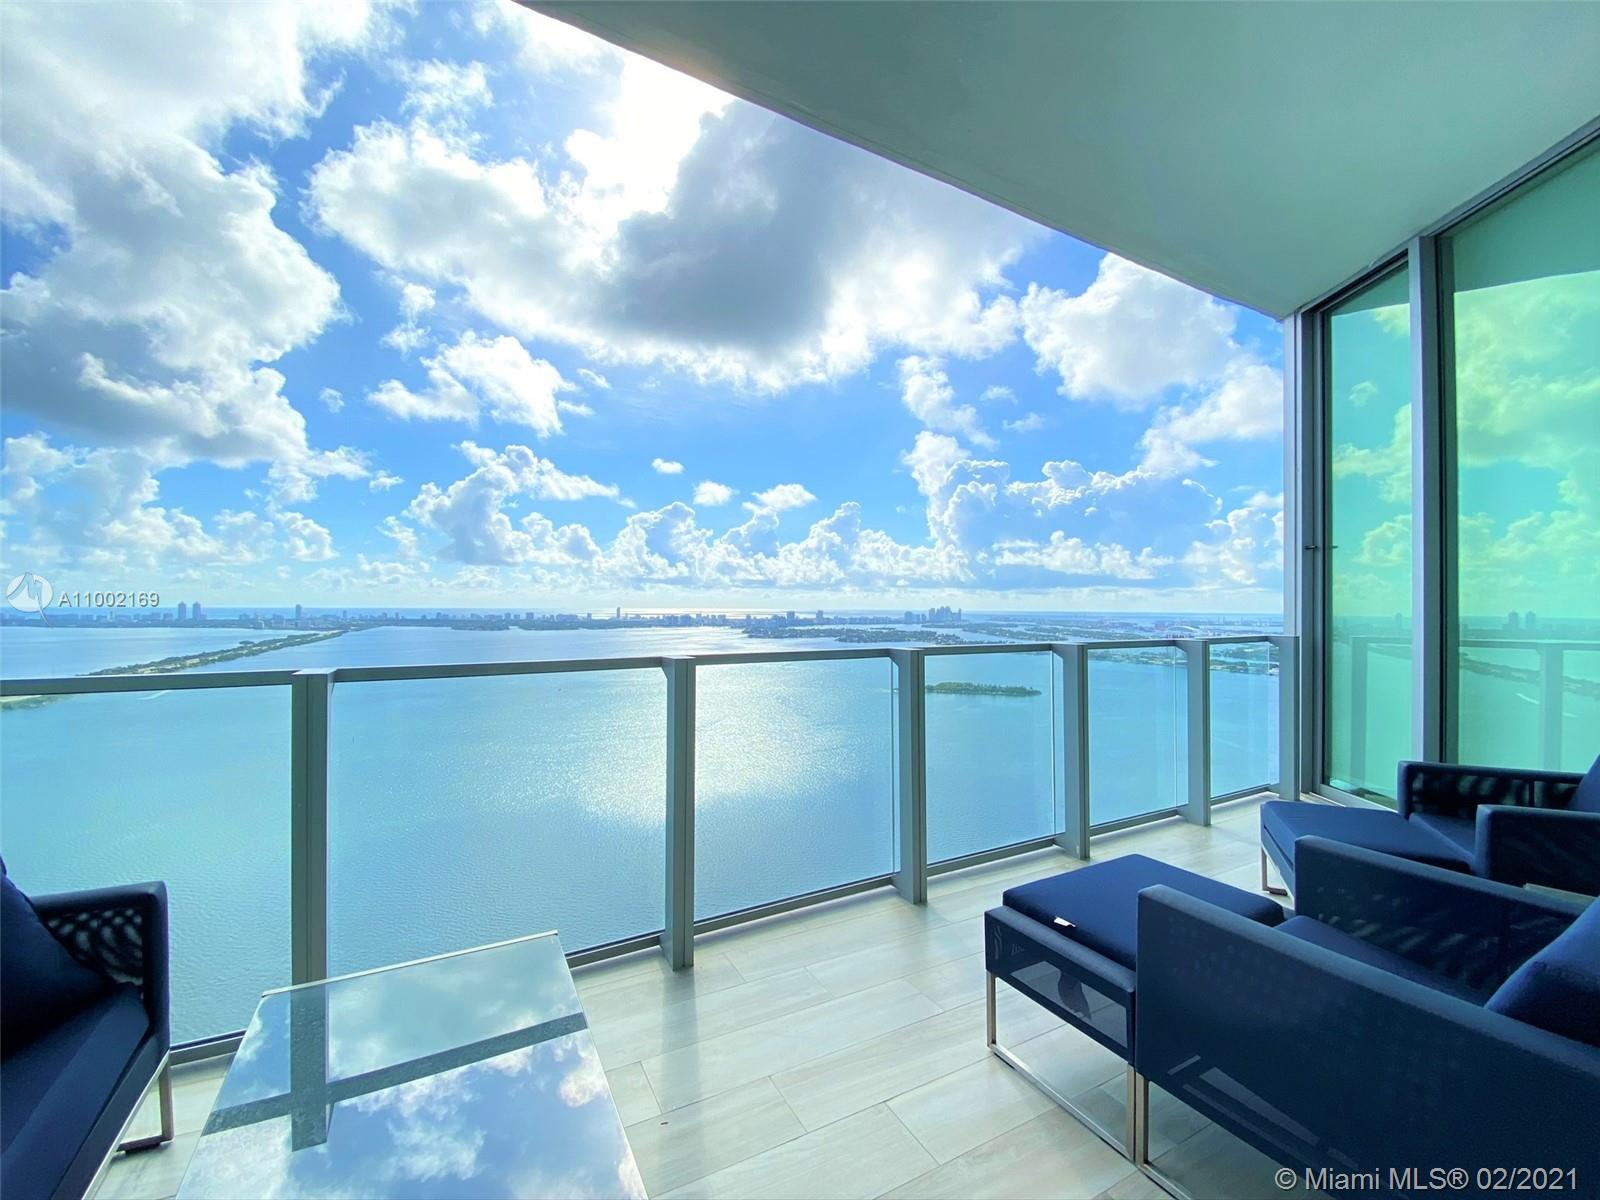 Biscayne Beach #UPH4604 - 2900 NE 7TH AVENUE #UPH4604, Miami, FL 33137